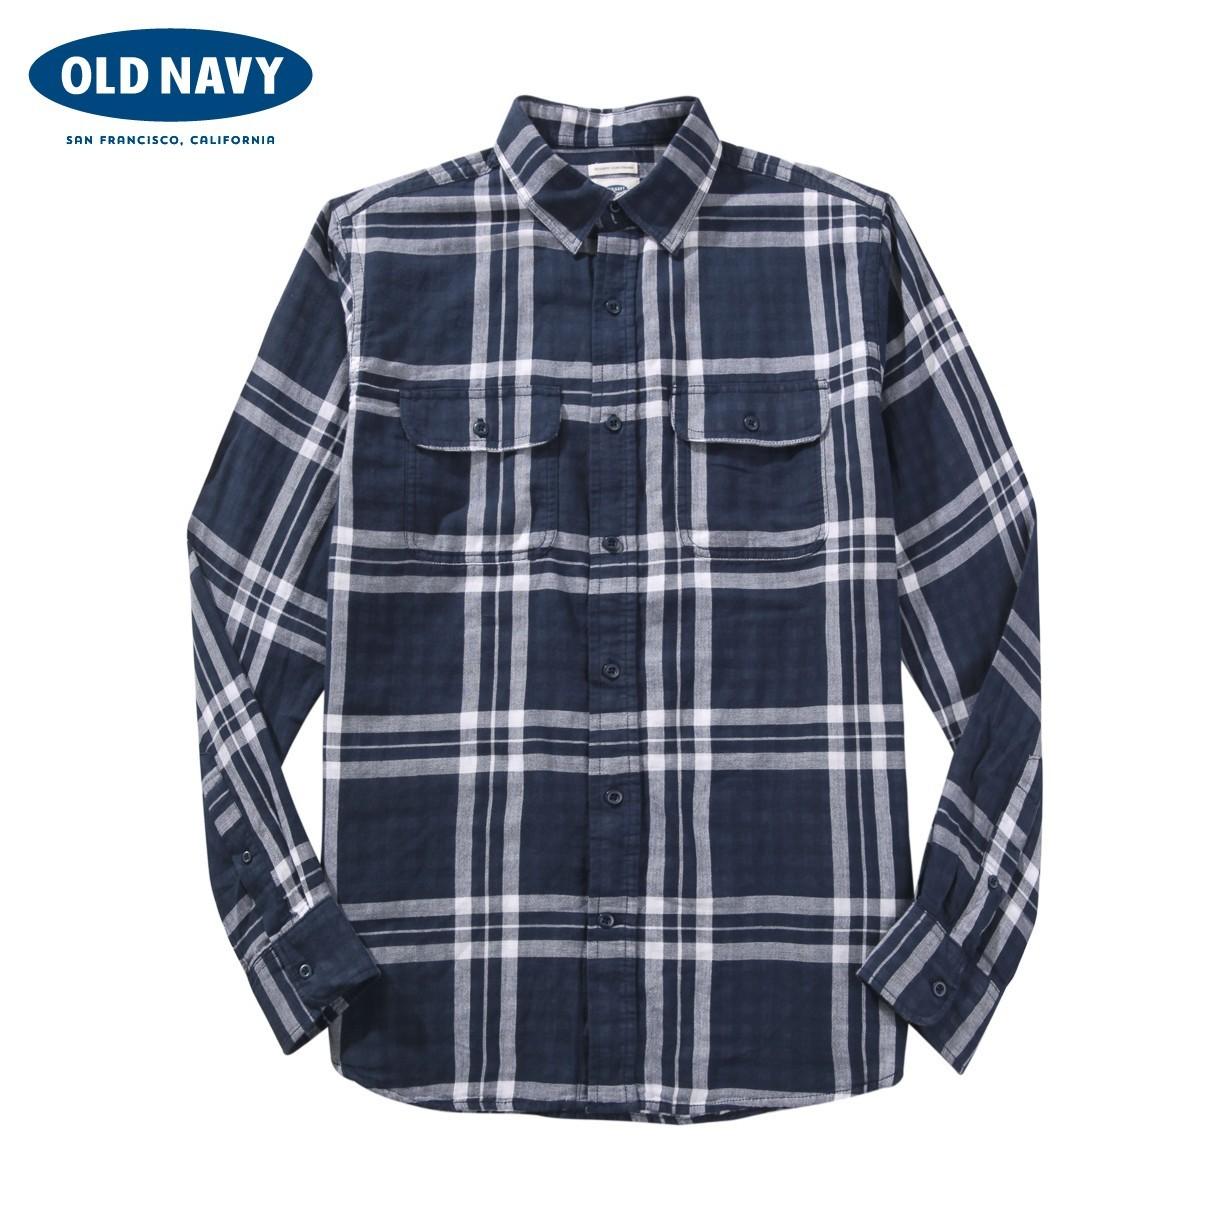 Рубашка мужская OLD NAVY 000146804 146804 рубашка мужская old navy 000438245 438245